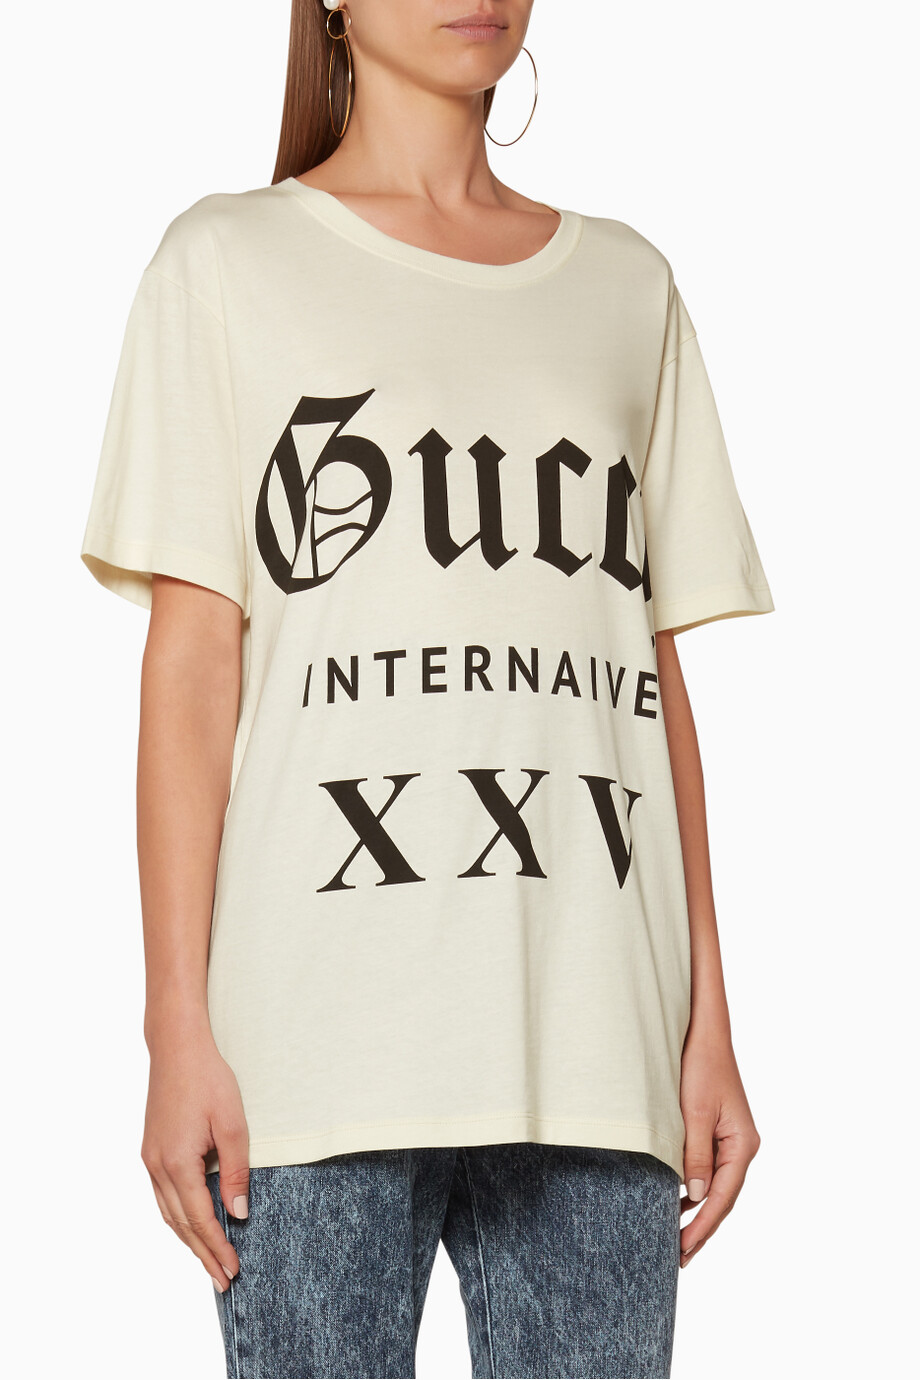 8254a2d9e Shop Gucci Multicolour Off-White Guccy XXV Oversize T-Shirt for ...